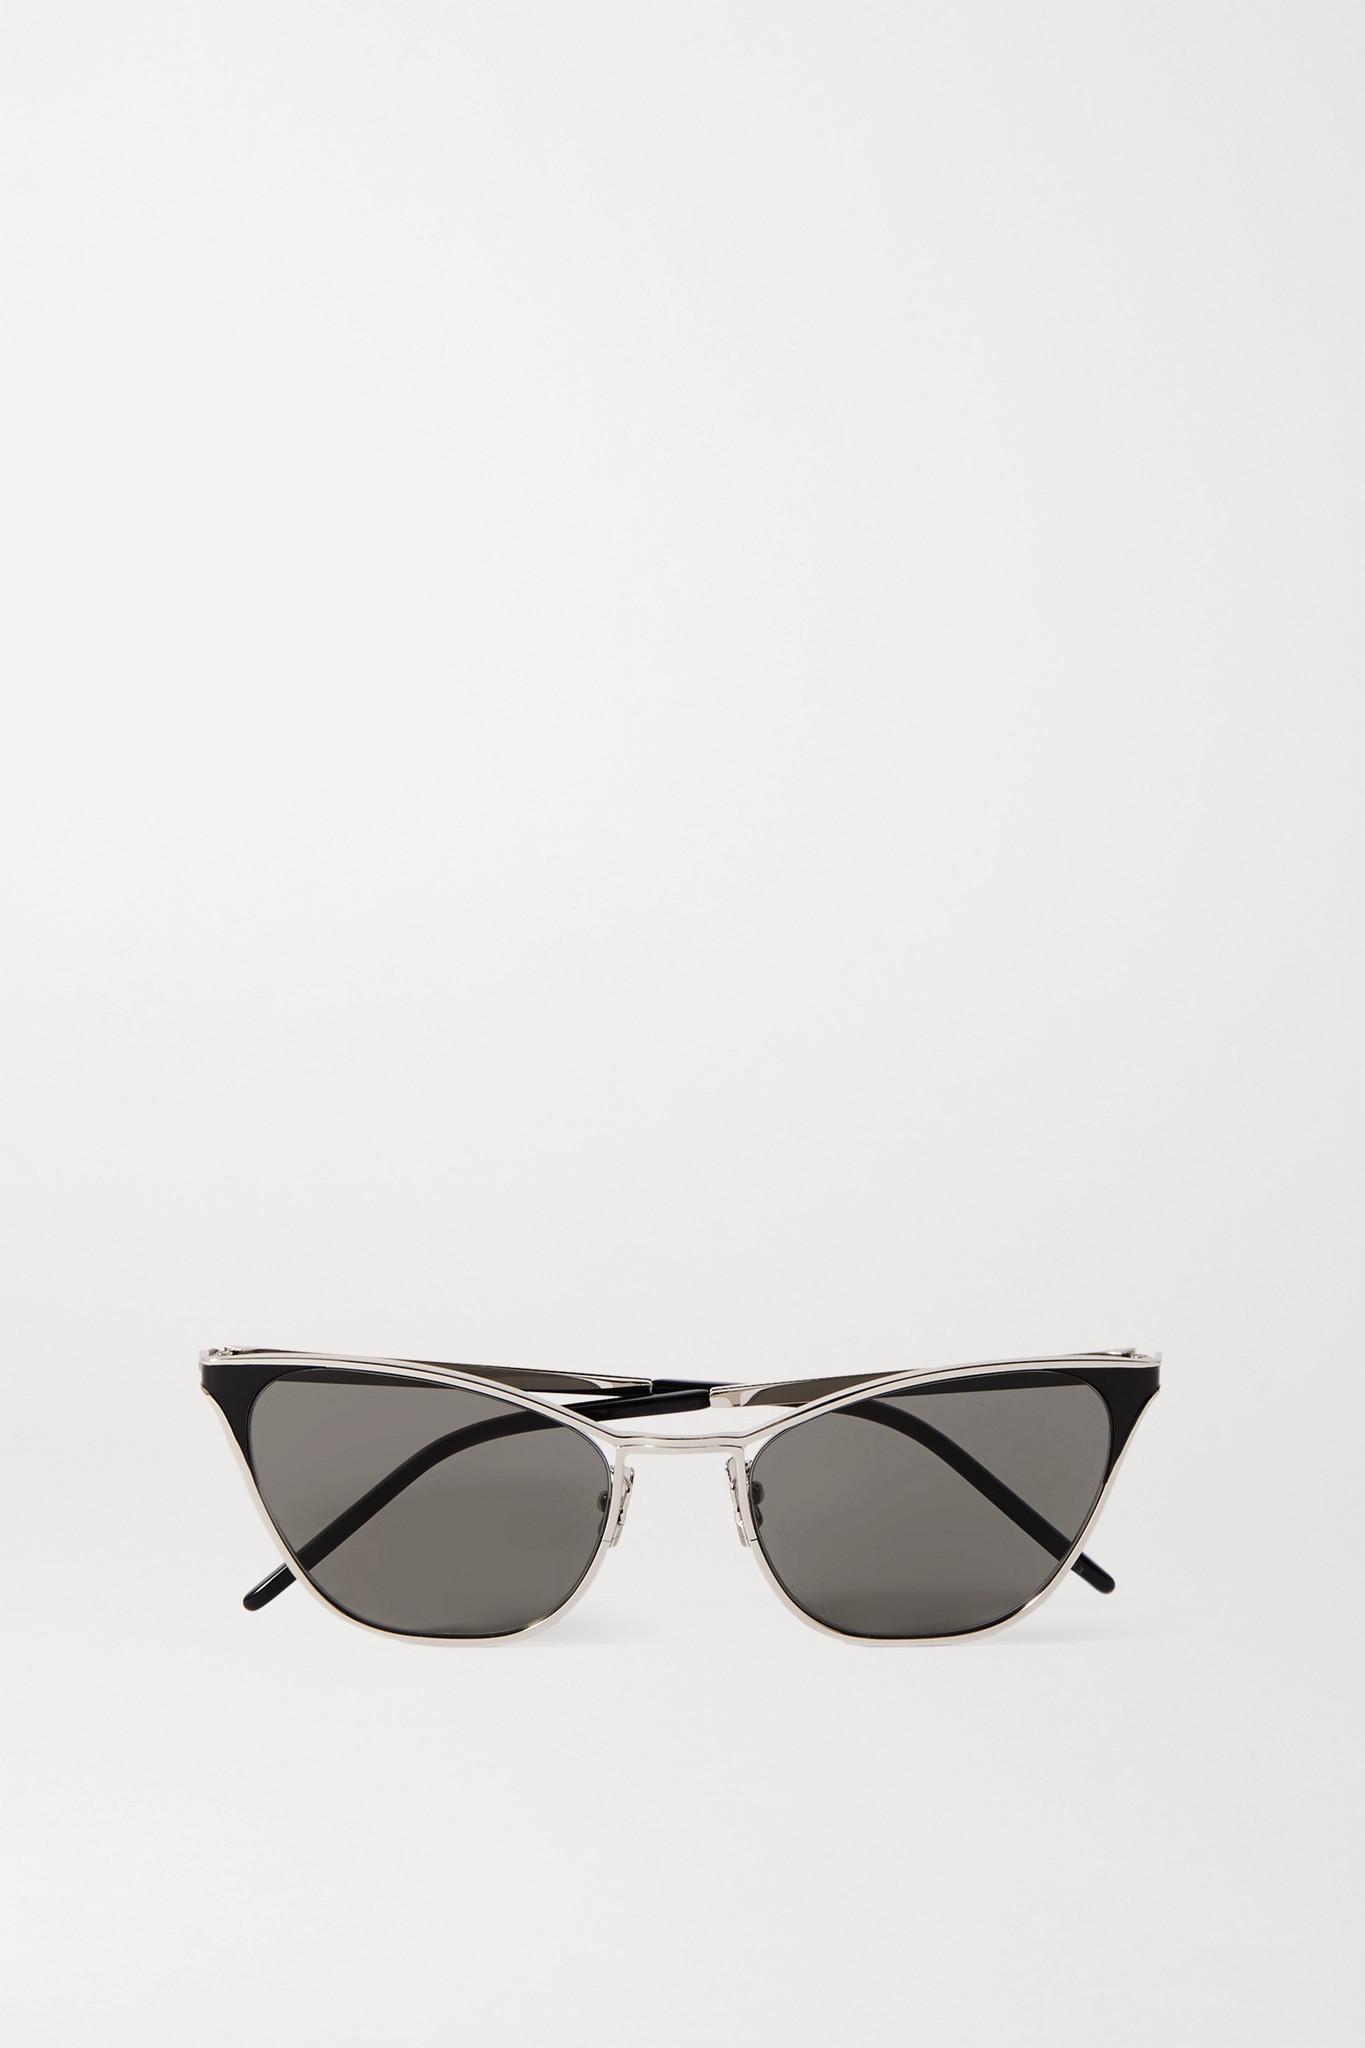 SAINT LAURENT - 板材银色金属猫眼太阳镜 - one size